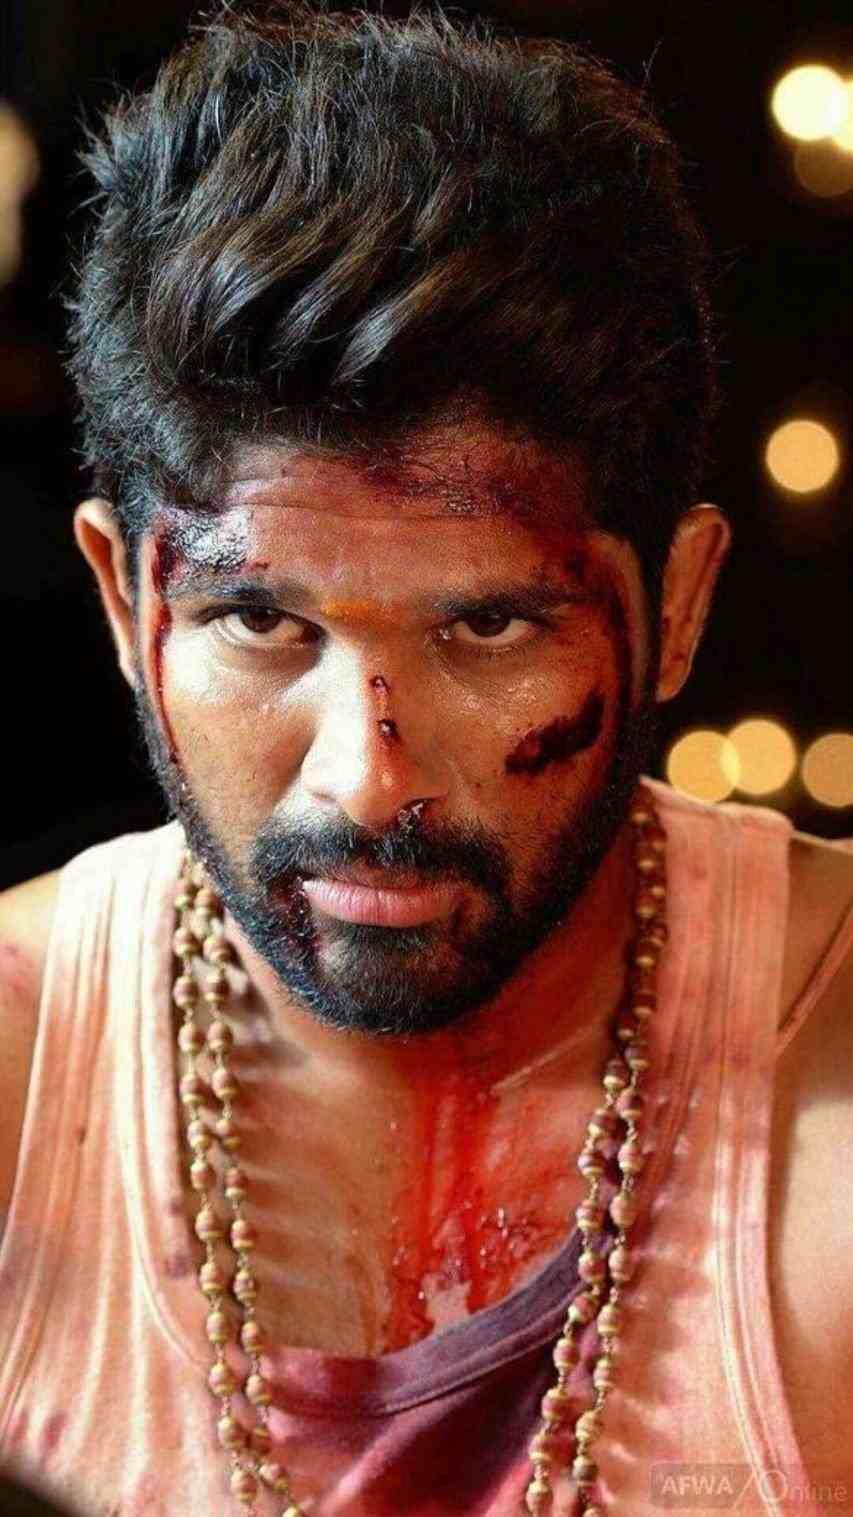 Balayagehair Club Nbspthis Website Is For Sale Nbspbalayagehair Resources And Information Prabhas Actor Allu Arjun Hairstyle Dj Movie